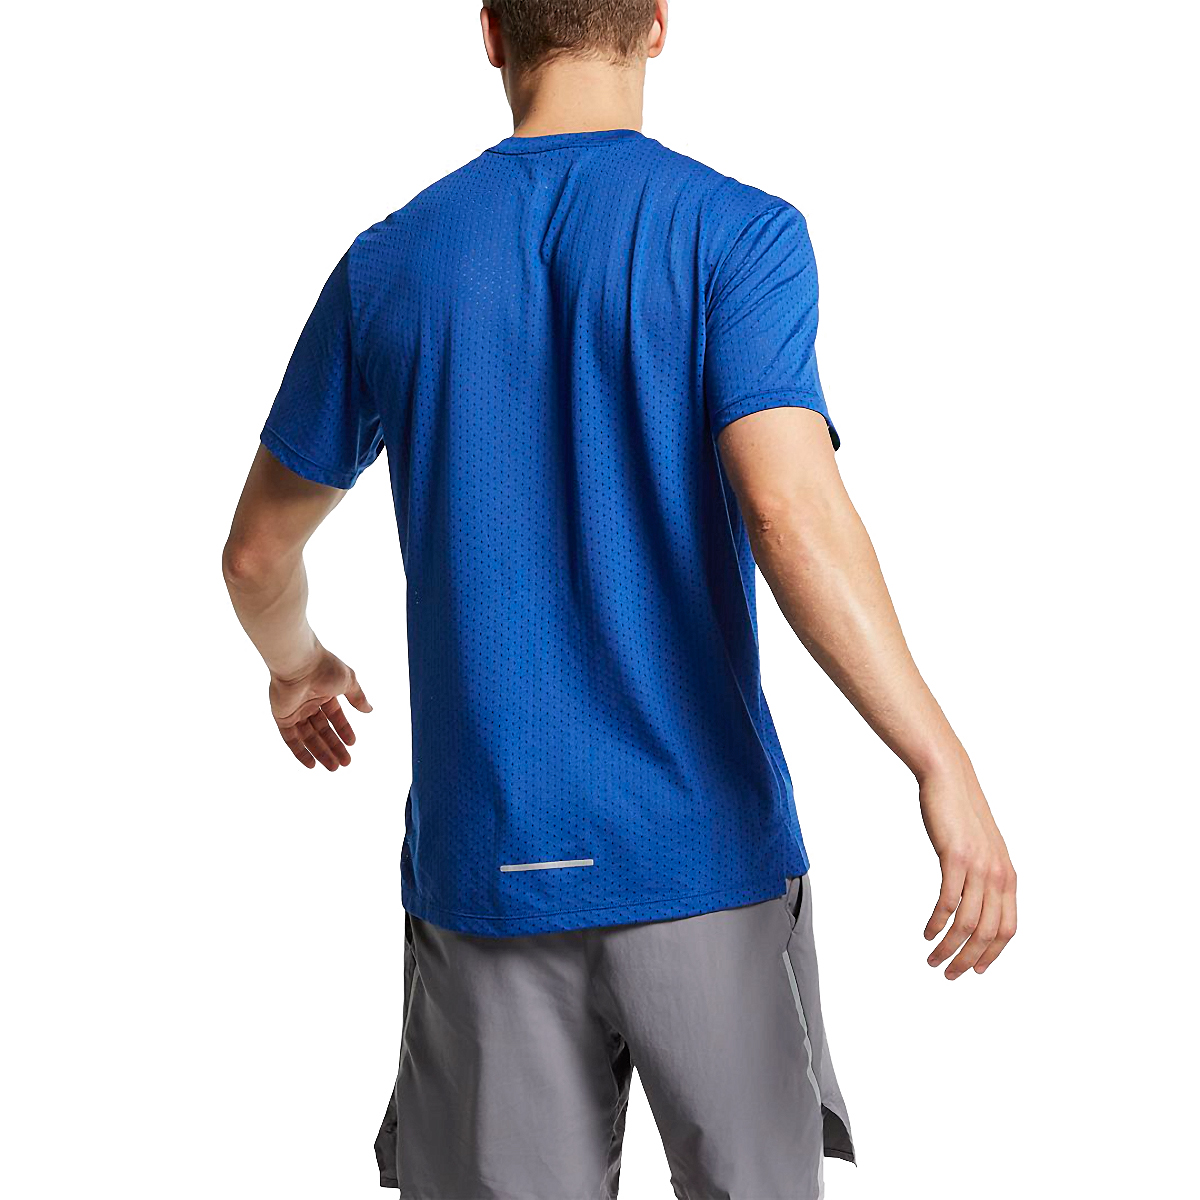 Men's Nike Breathe Rise 365 Short Sleeve - Color: Indigo Force/Reflective - Size: S, Indigo Force/Reflective, large, image 2